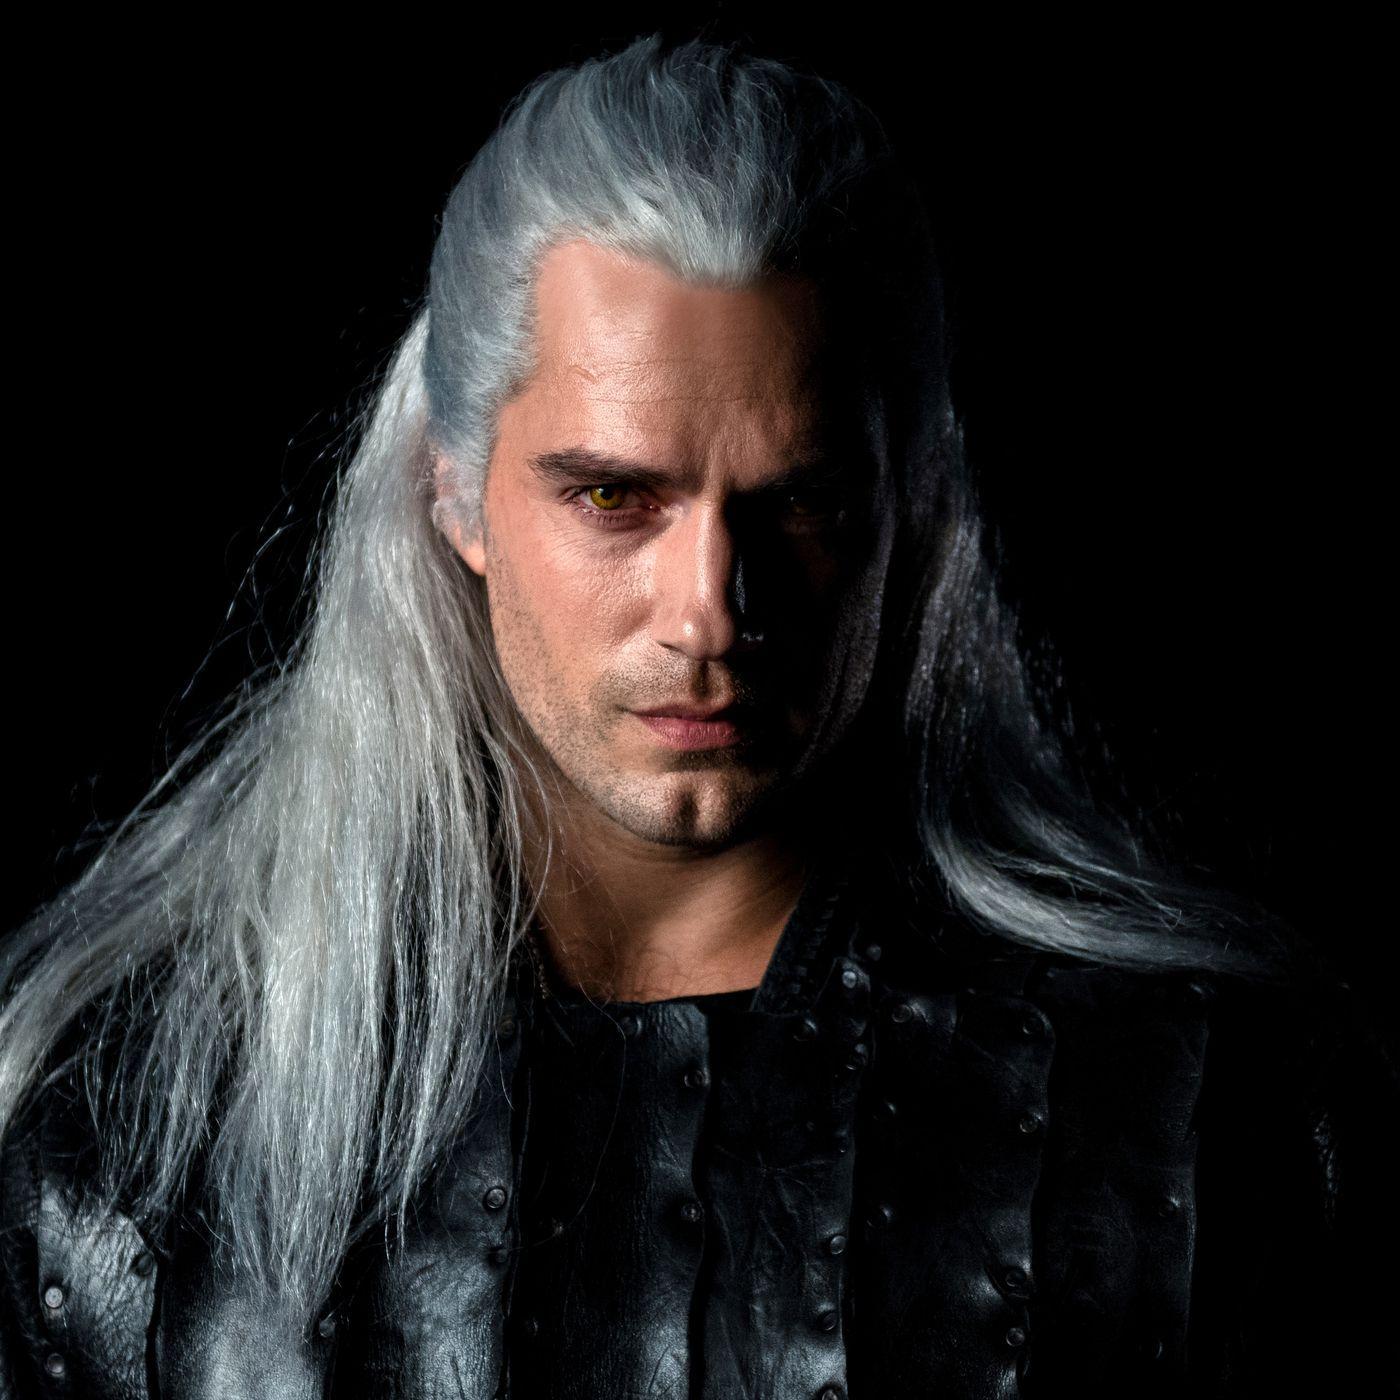 Henry Cavill The Witcher The Witcher The Witcher Netflix Henry Cavill